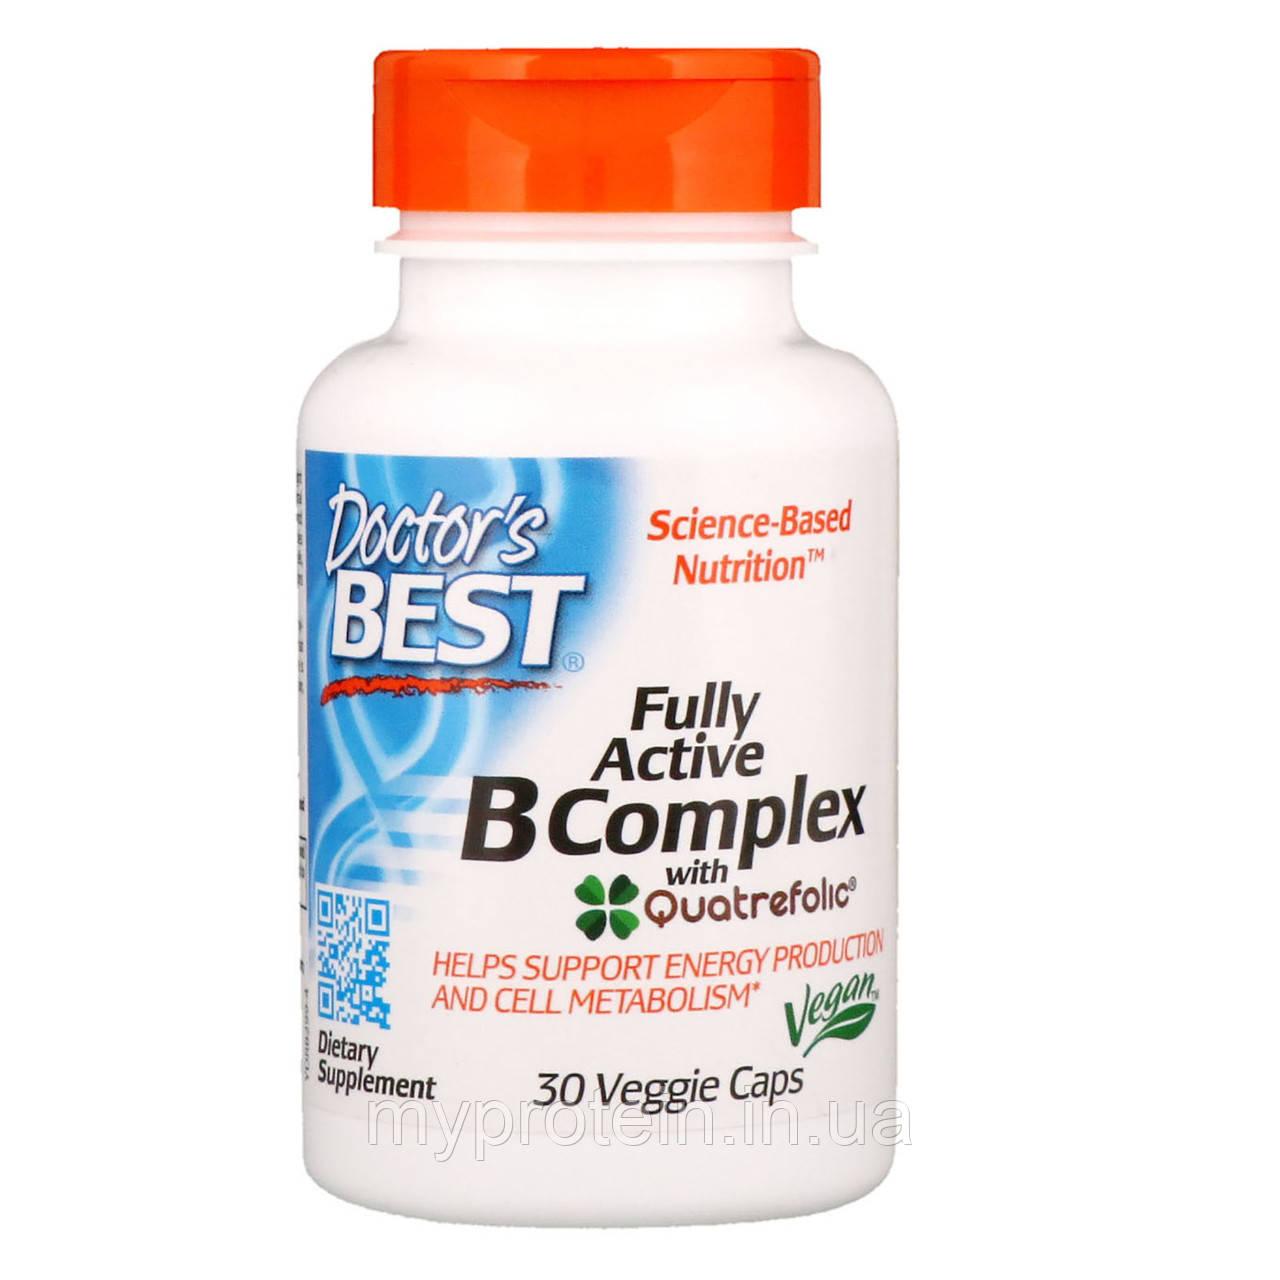 Doctor's BEST комплекс витамин Fully Active B Complex30 veg caps